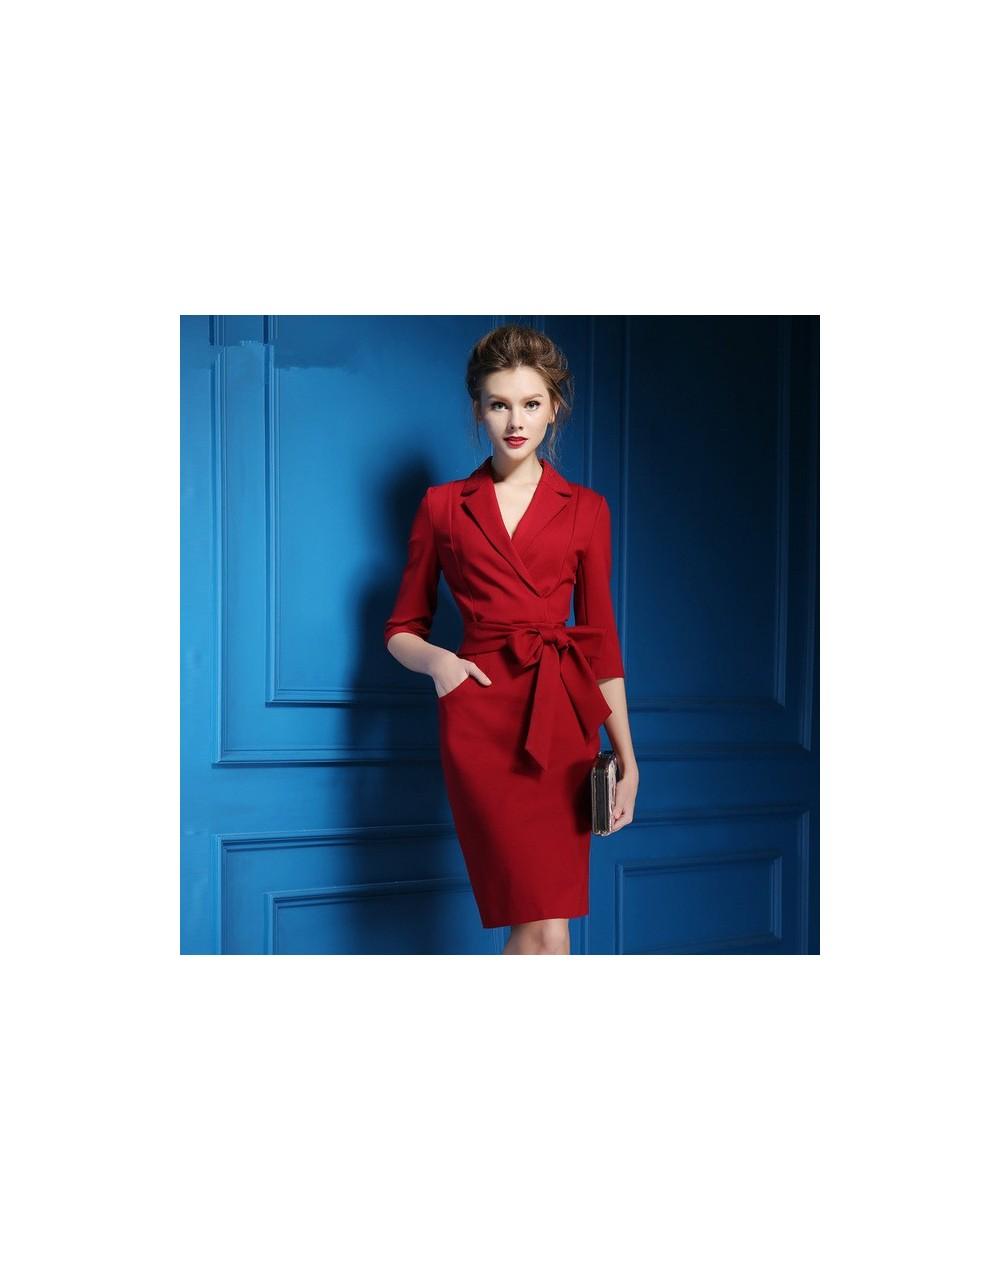 Elegant Women Suit Dress Fashion Casual Lace Up Notched Dress Suits Office Lady One Piece Dresses Business Work Long Blazers...